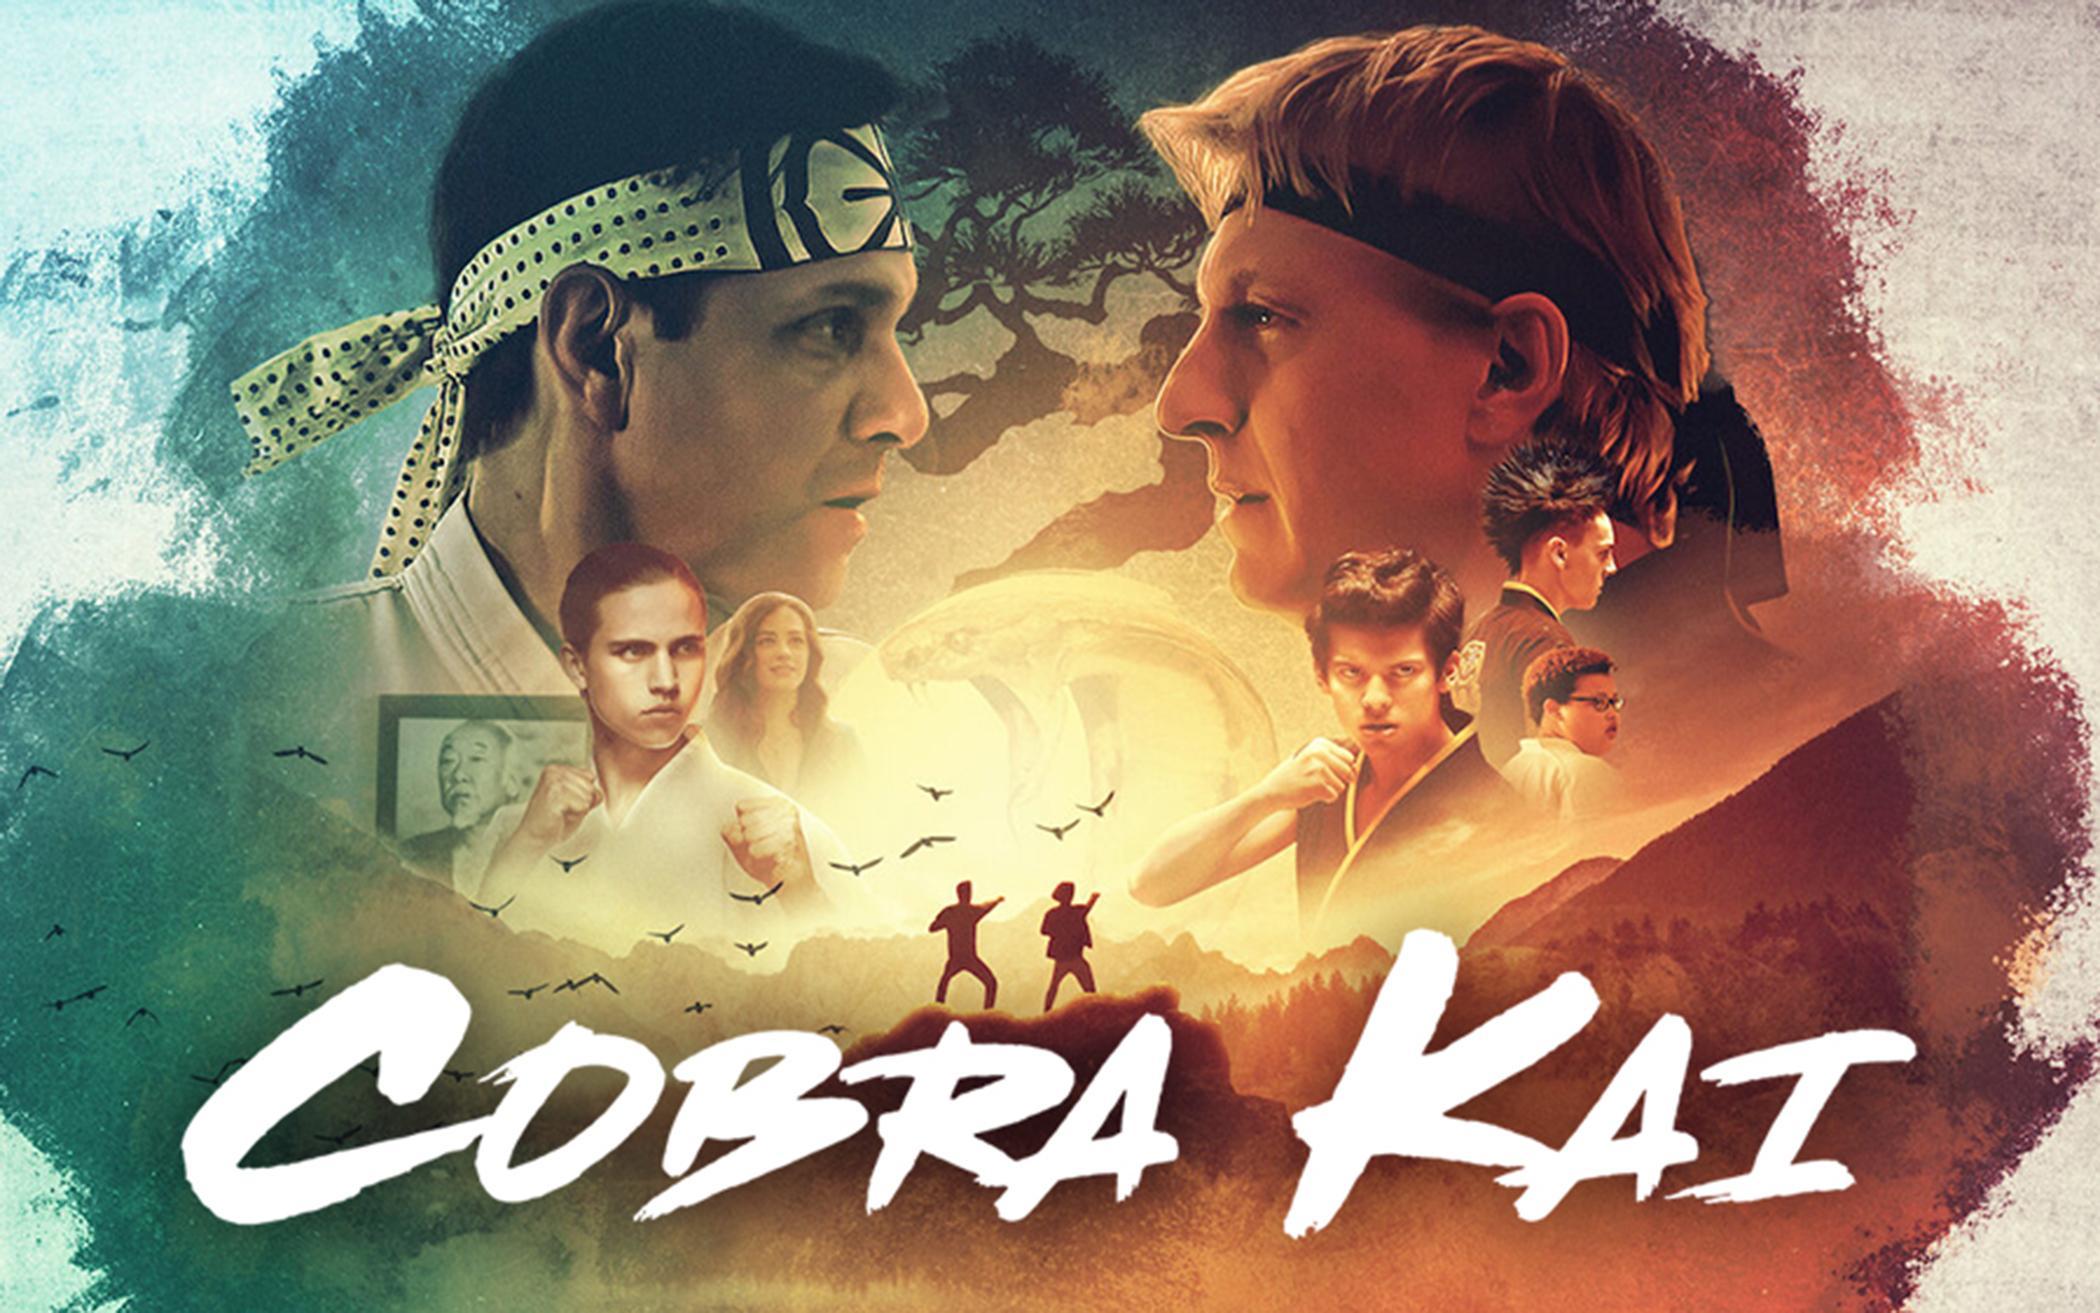 """Cobra Kai"" Season 4 Release Date Rumors: When Is The New Season Arriving On Netflix?"